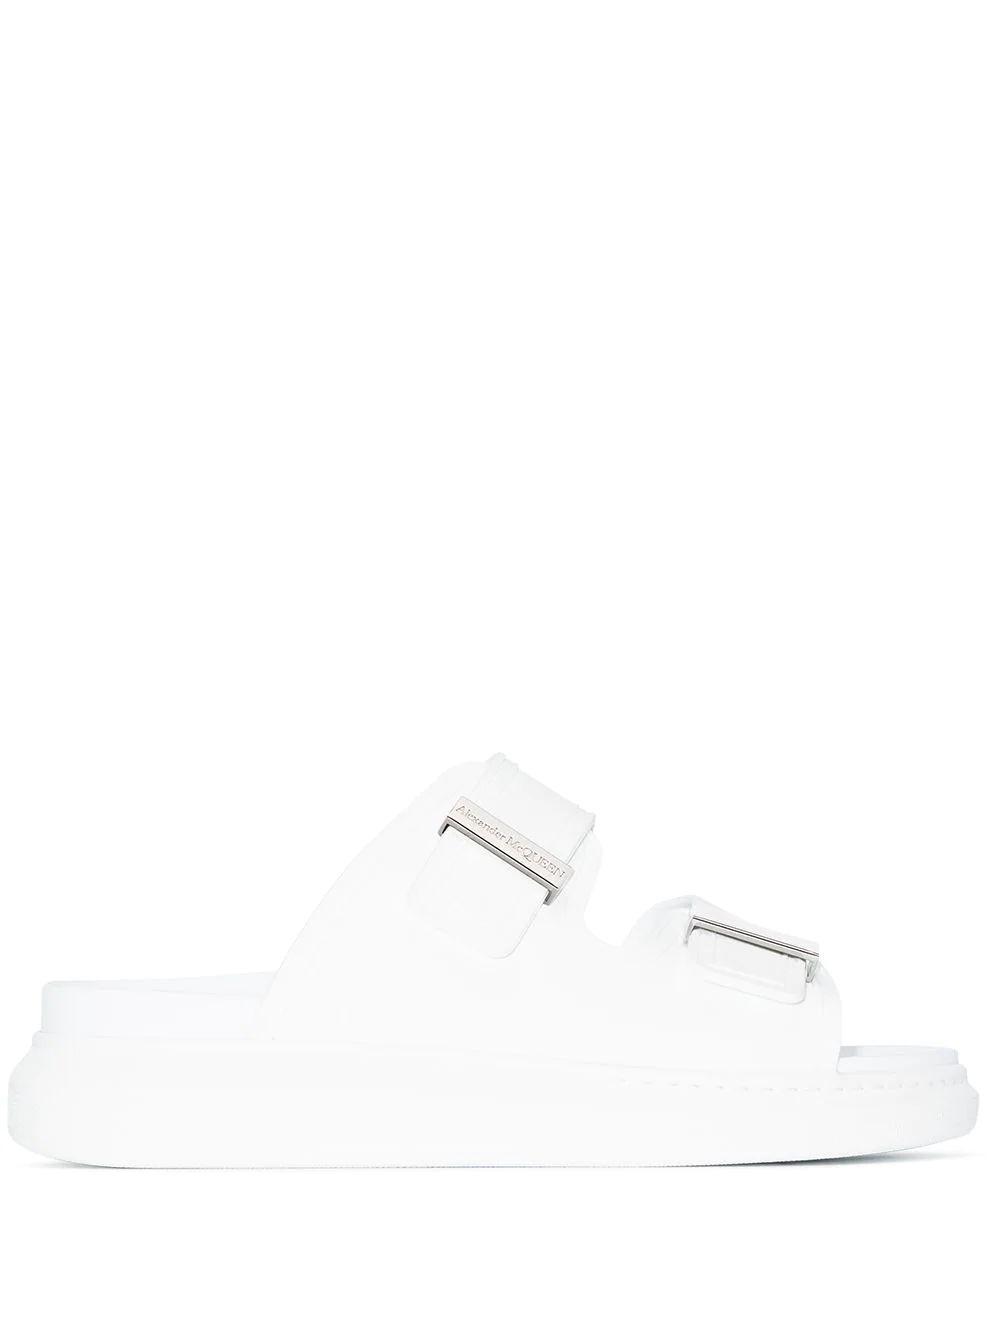 Double Thick Strap Slide Sandal Item # 658063W4Q51